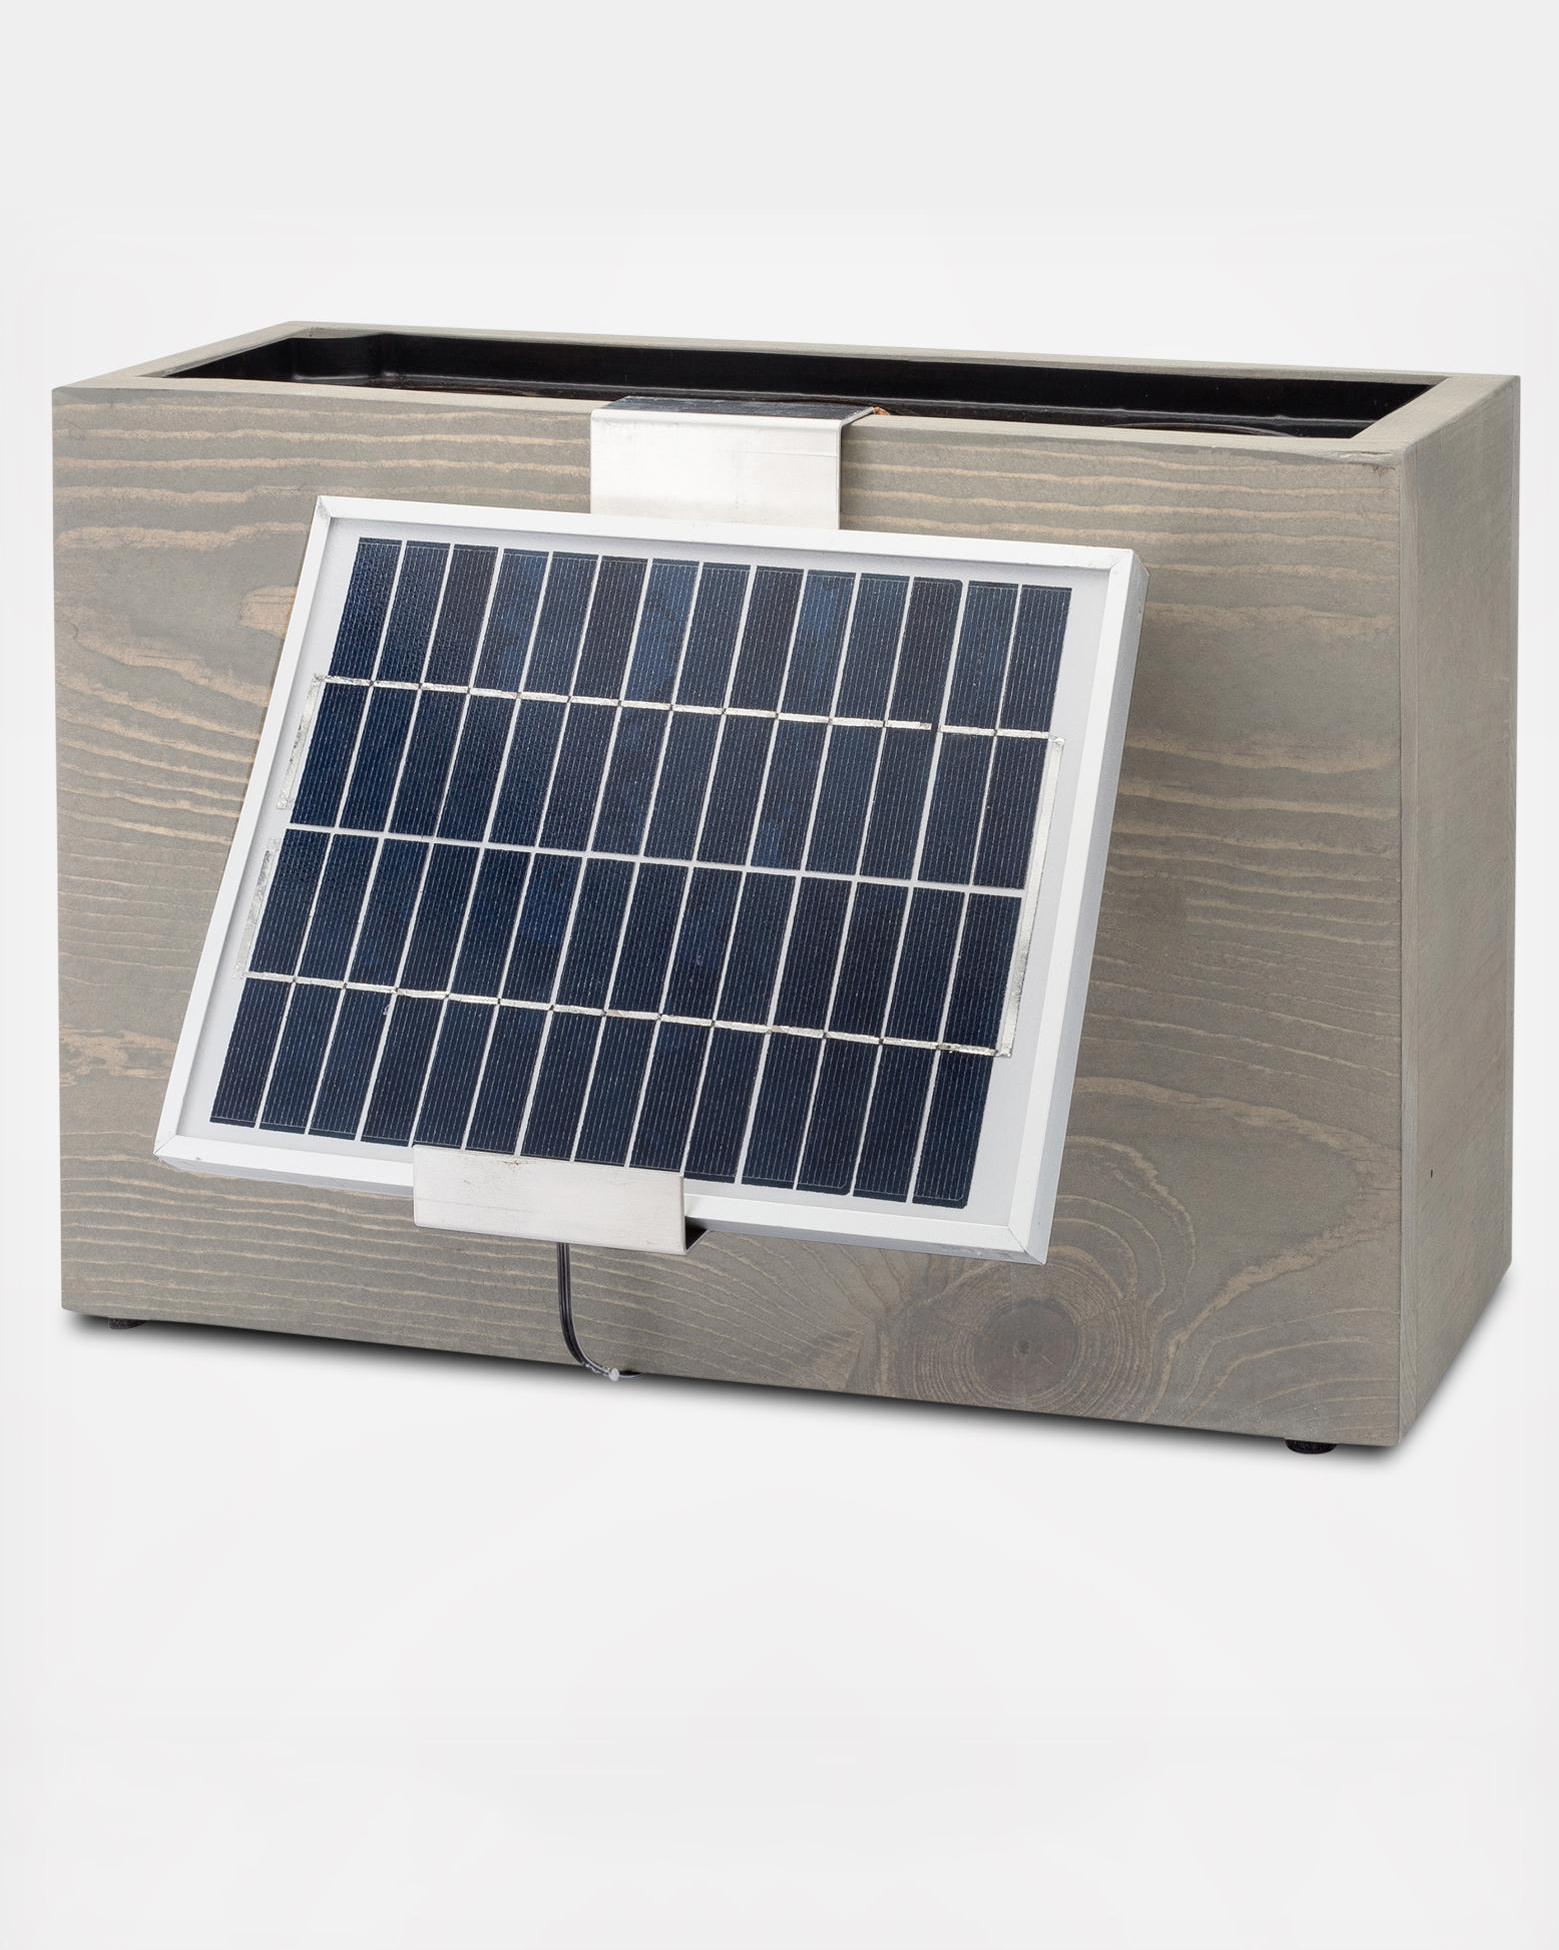 hydro planter solar powered